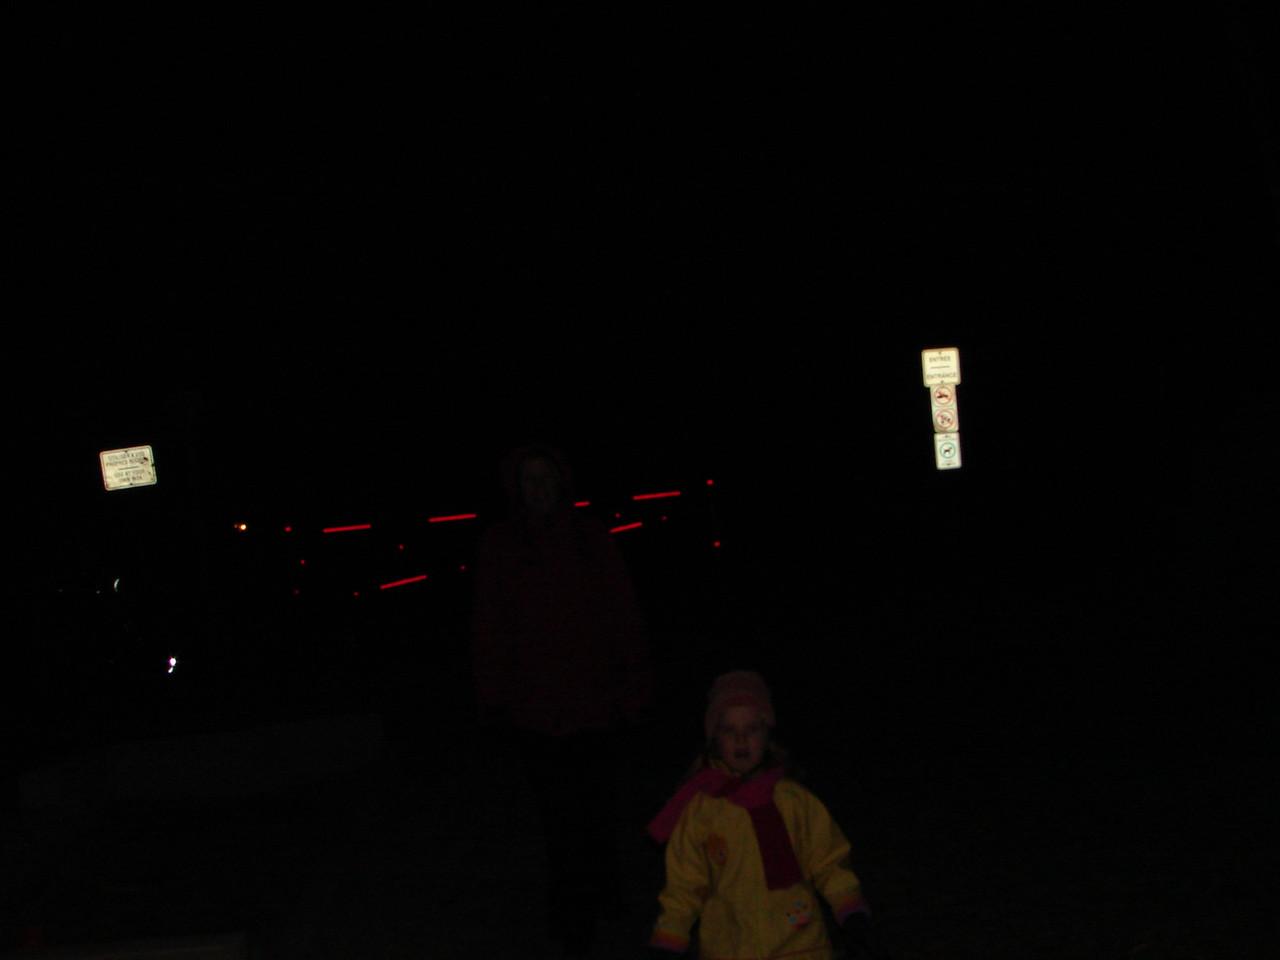 Spectators and cheering family in the dark november park.